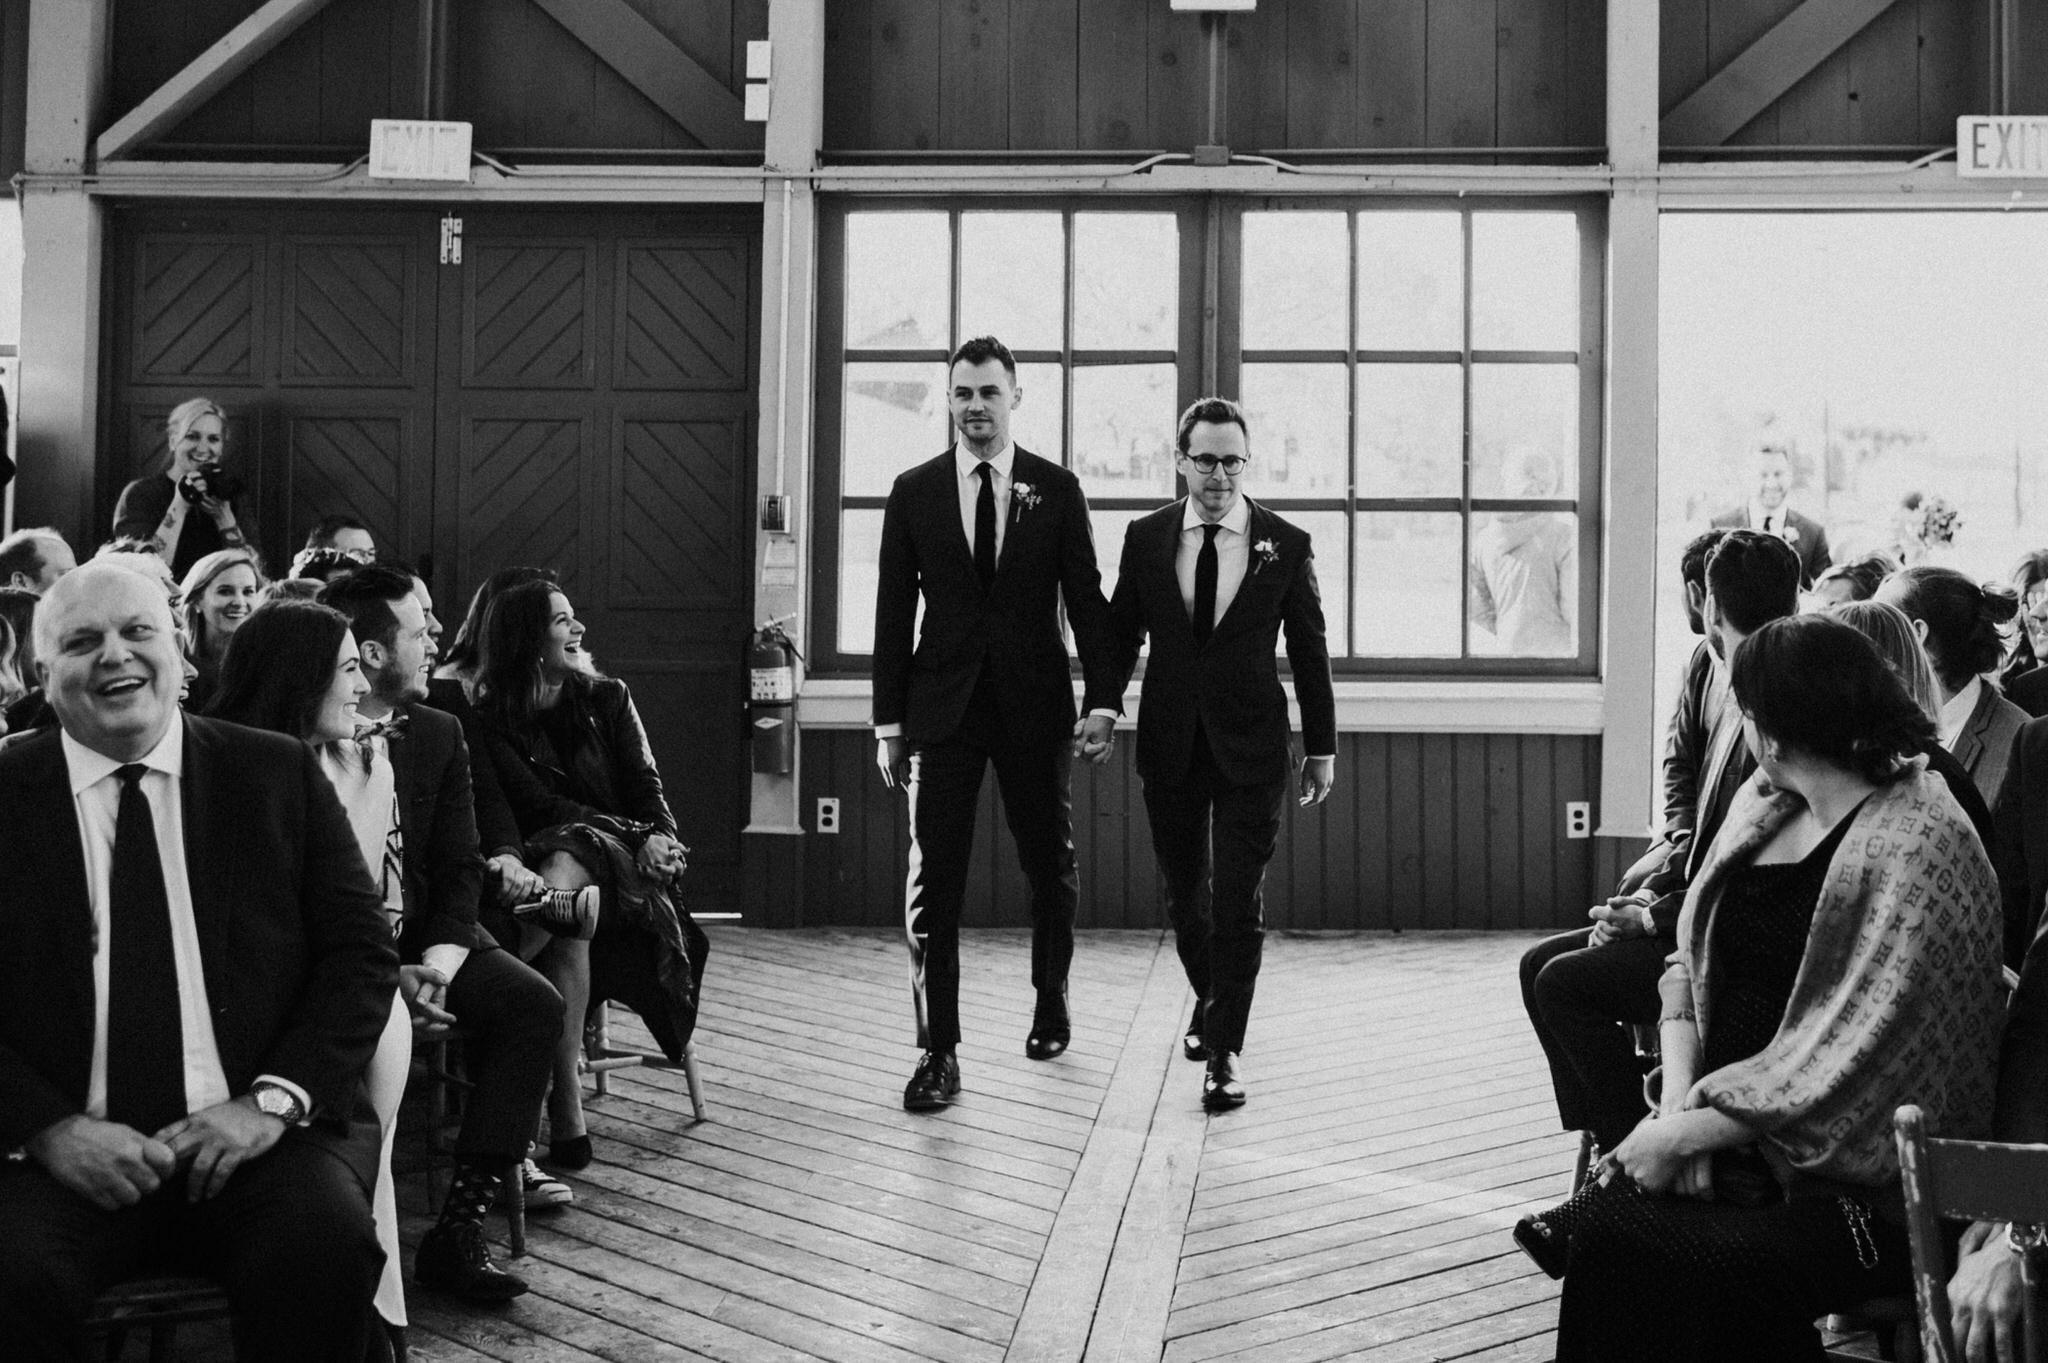 scarletoneillphotography_weddingphotography_prince edward county weddings106.JPG